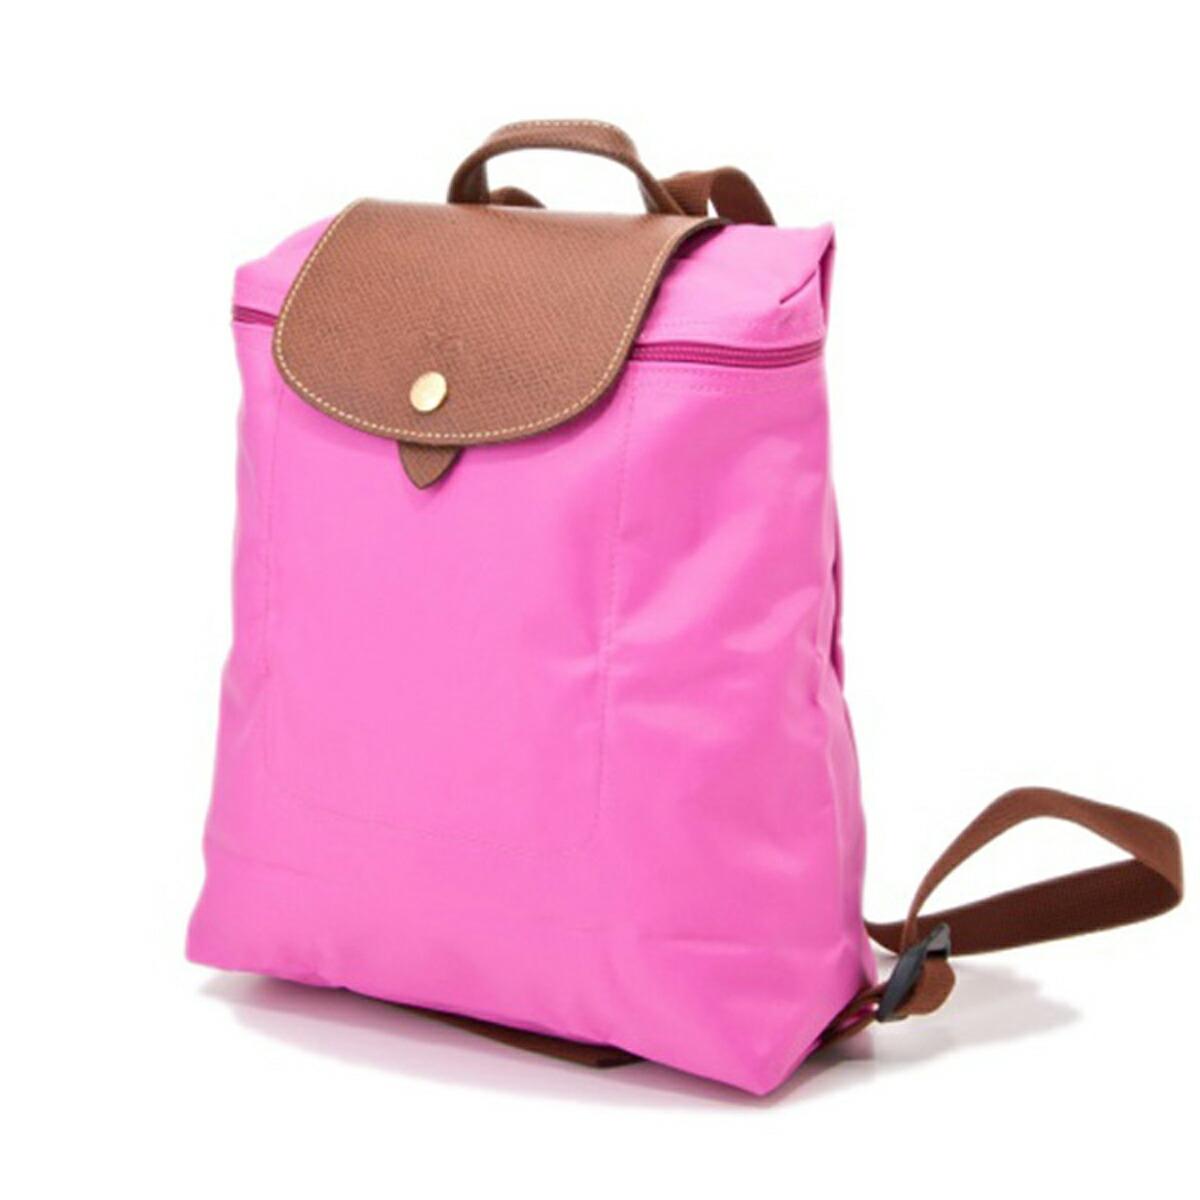 436bba2b984 Latest Cheap Light Longchamp Bubble Bags Light Pink | Rigolade